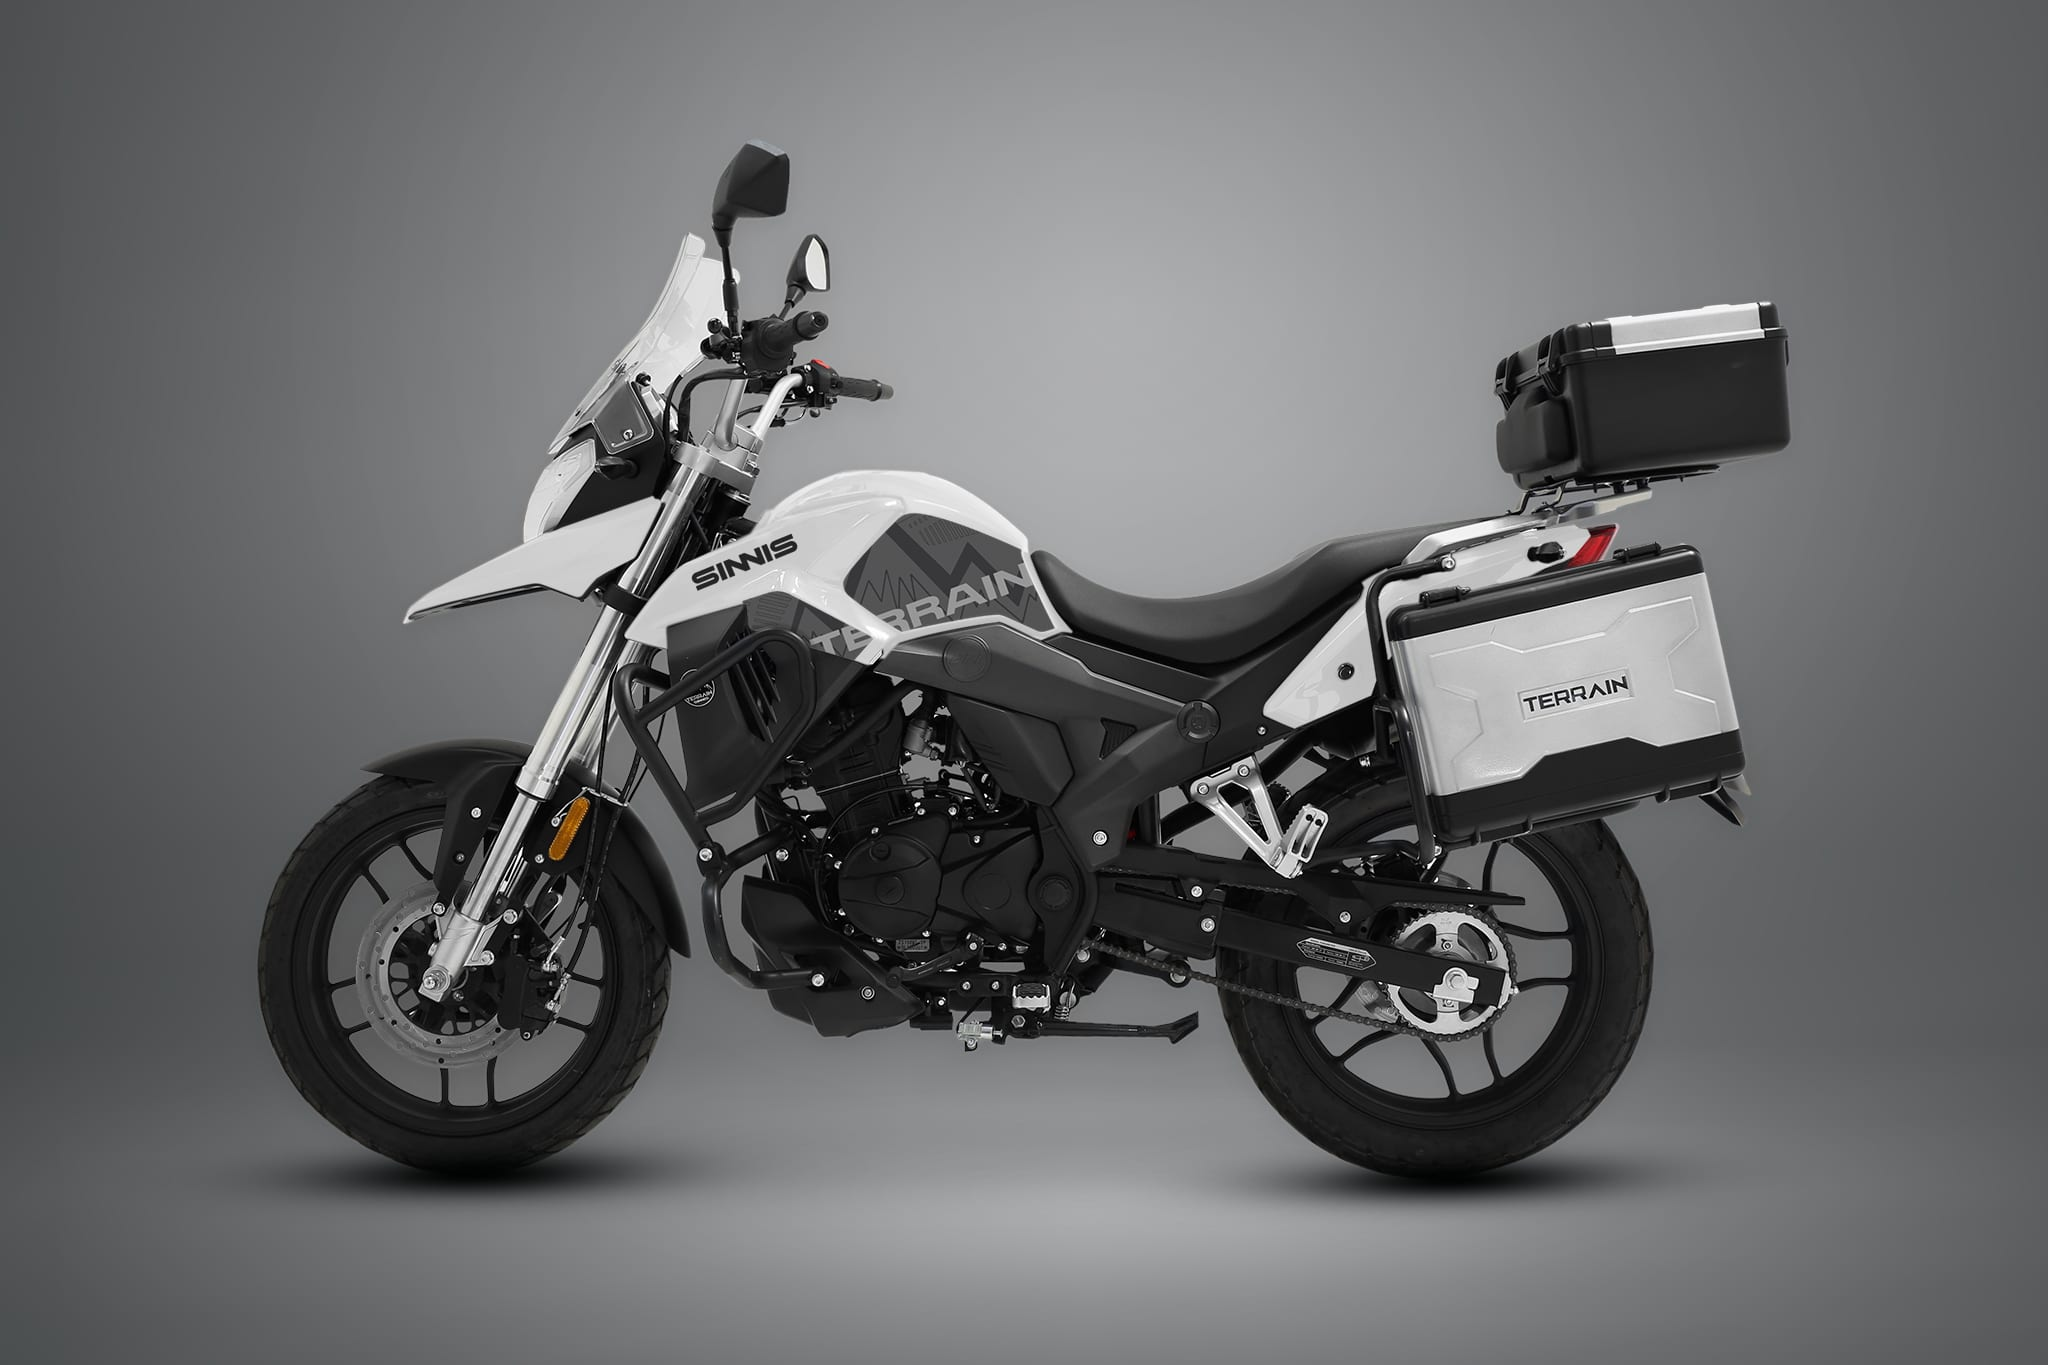 2021 Sinnis T125 Motorcycle arctic white